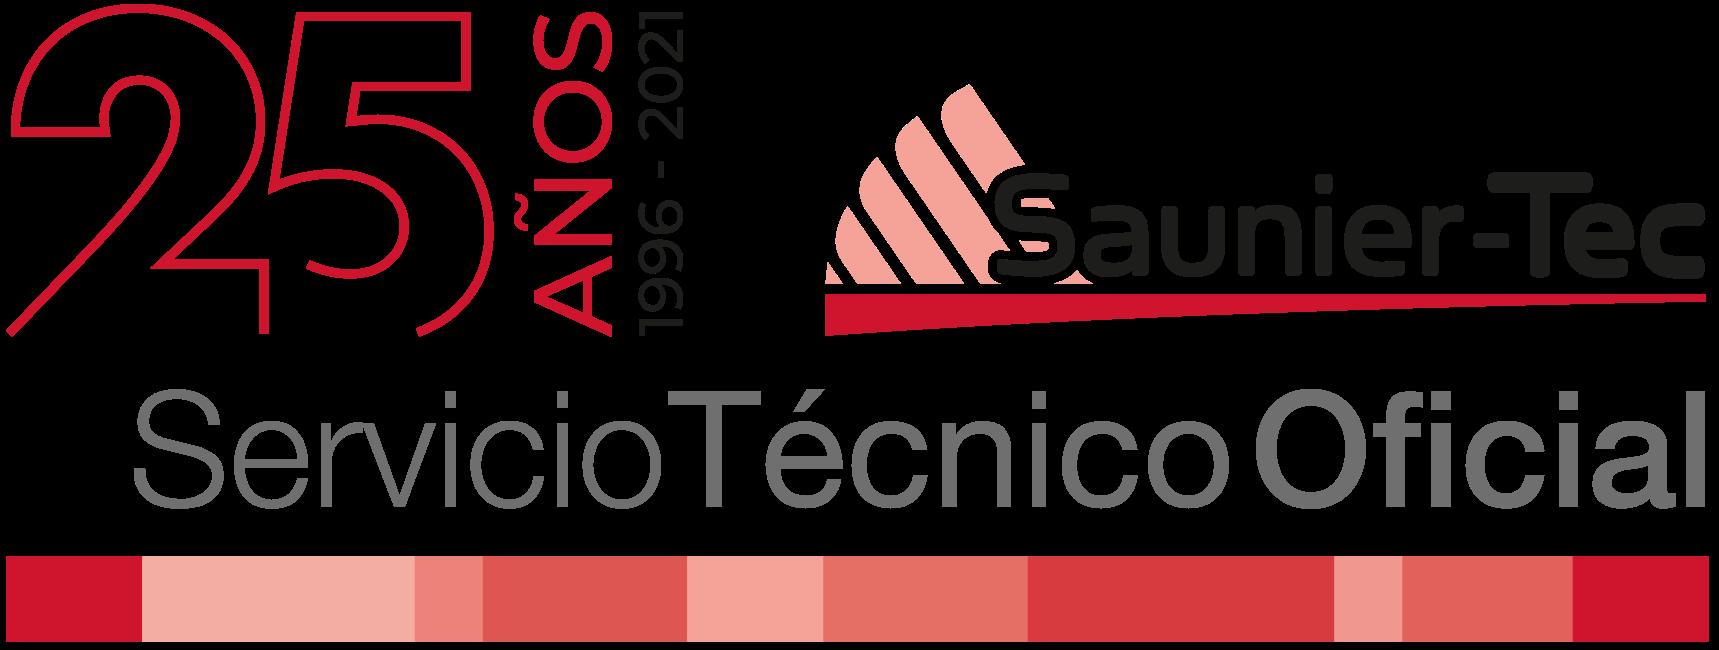 Saunier-Tec